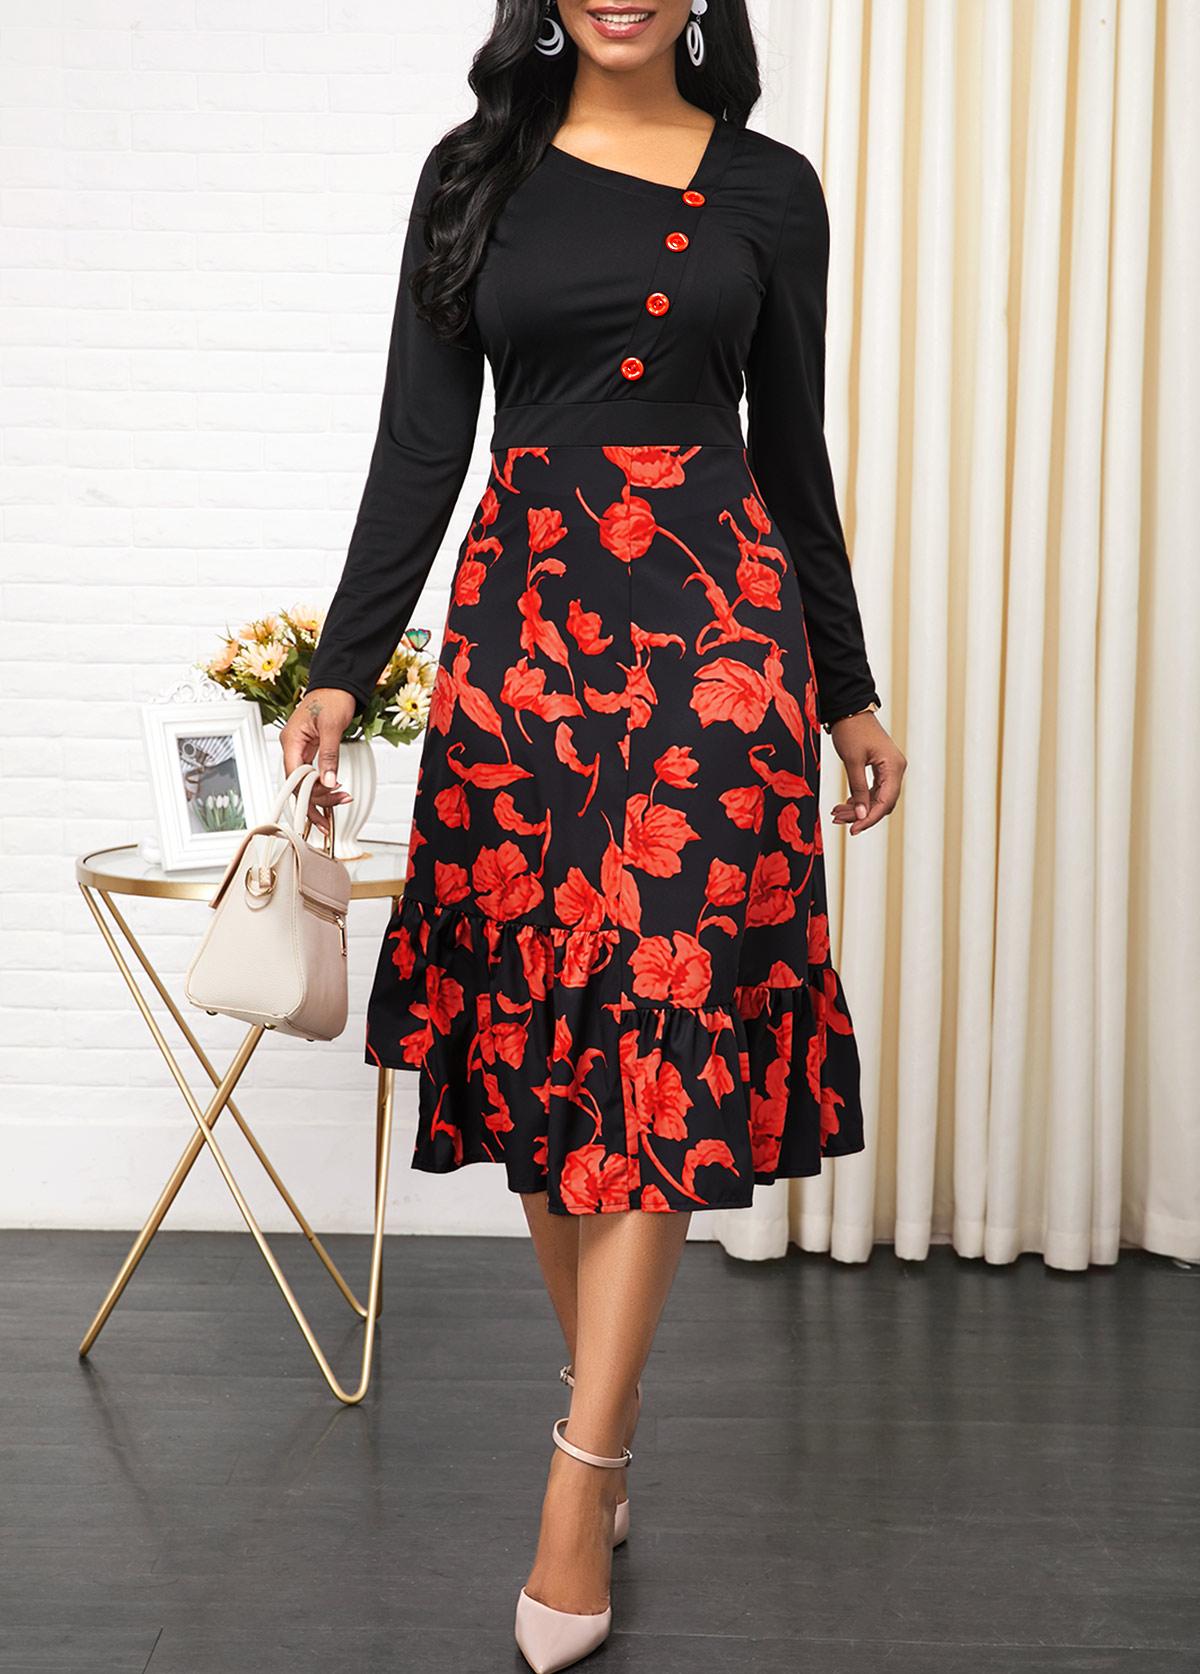 Side Zipper Floral Print Button Detail Dress